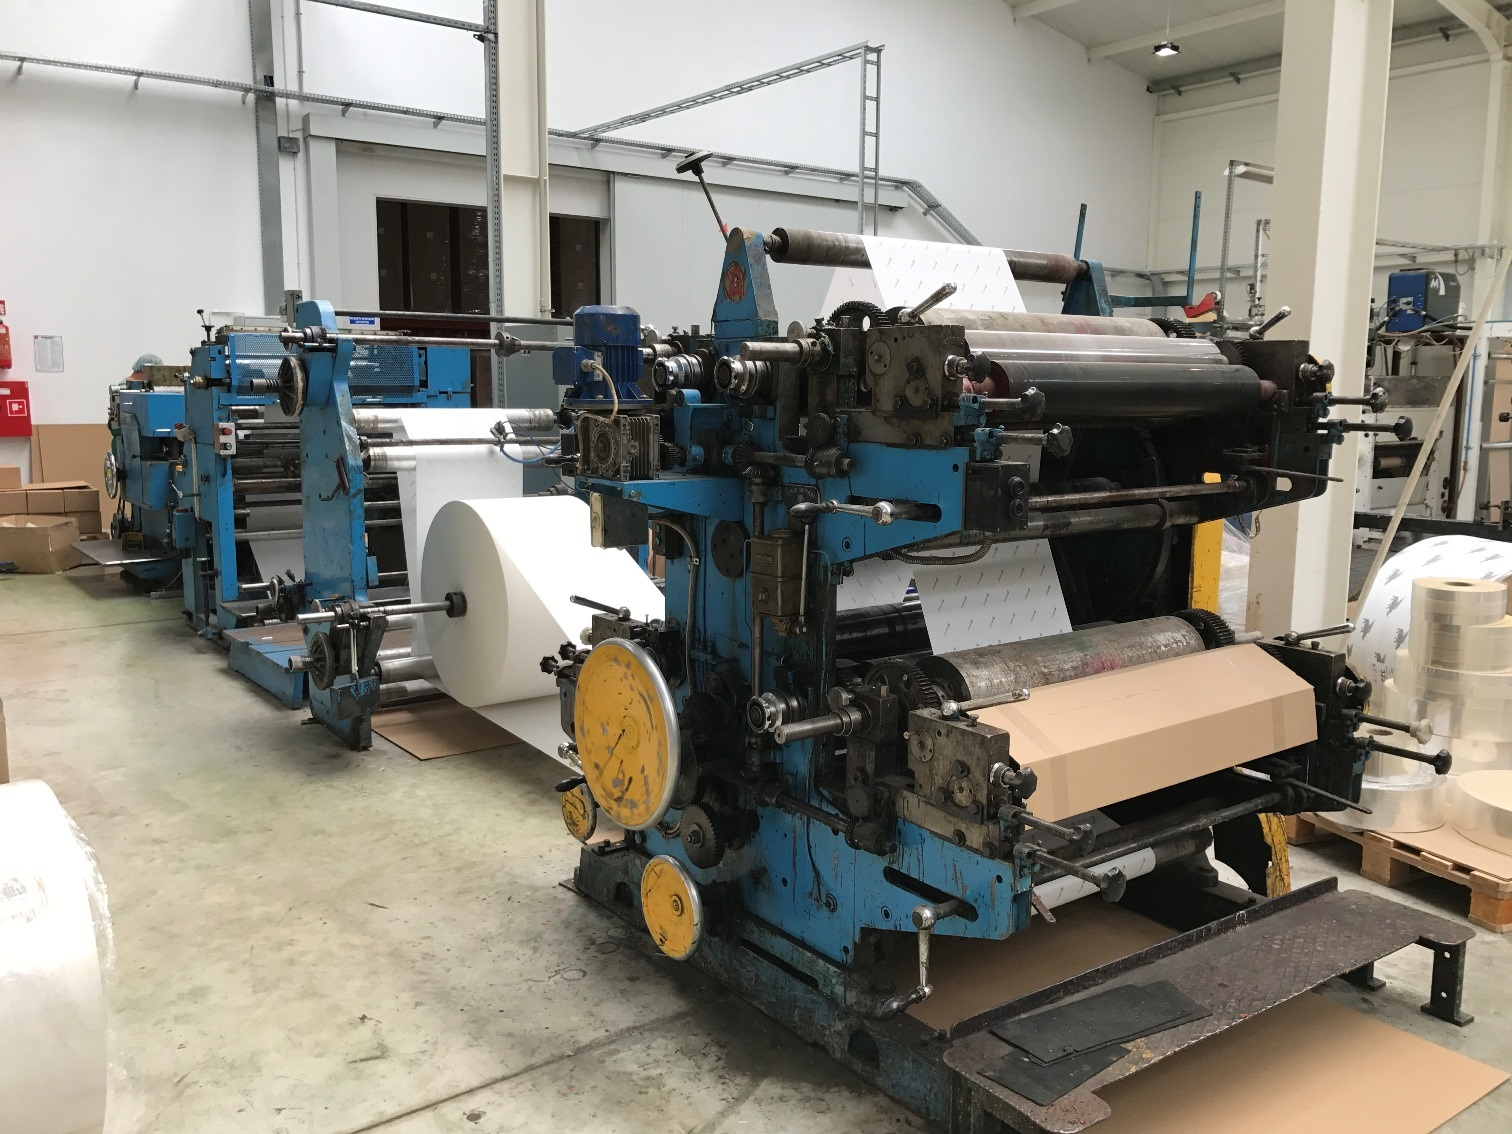 Qms 860 printer